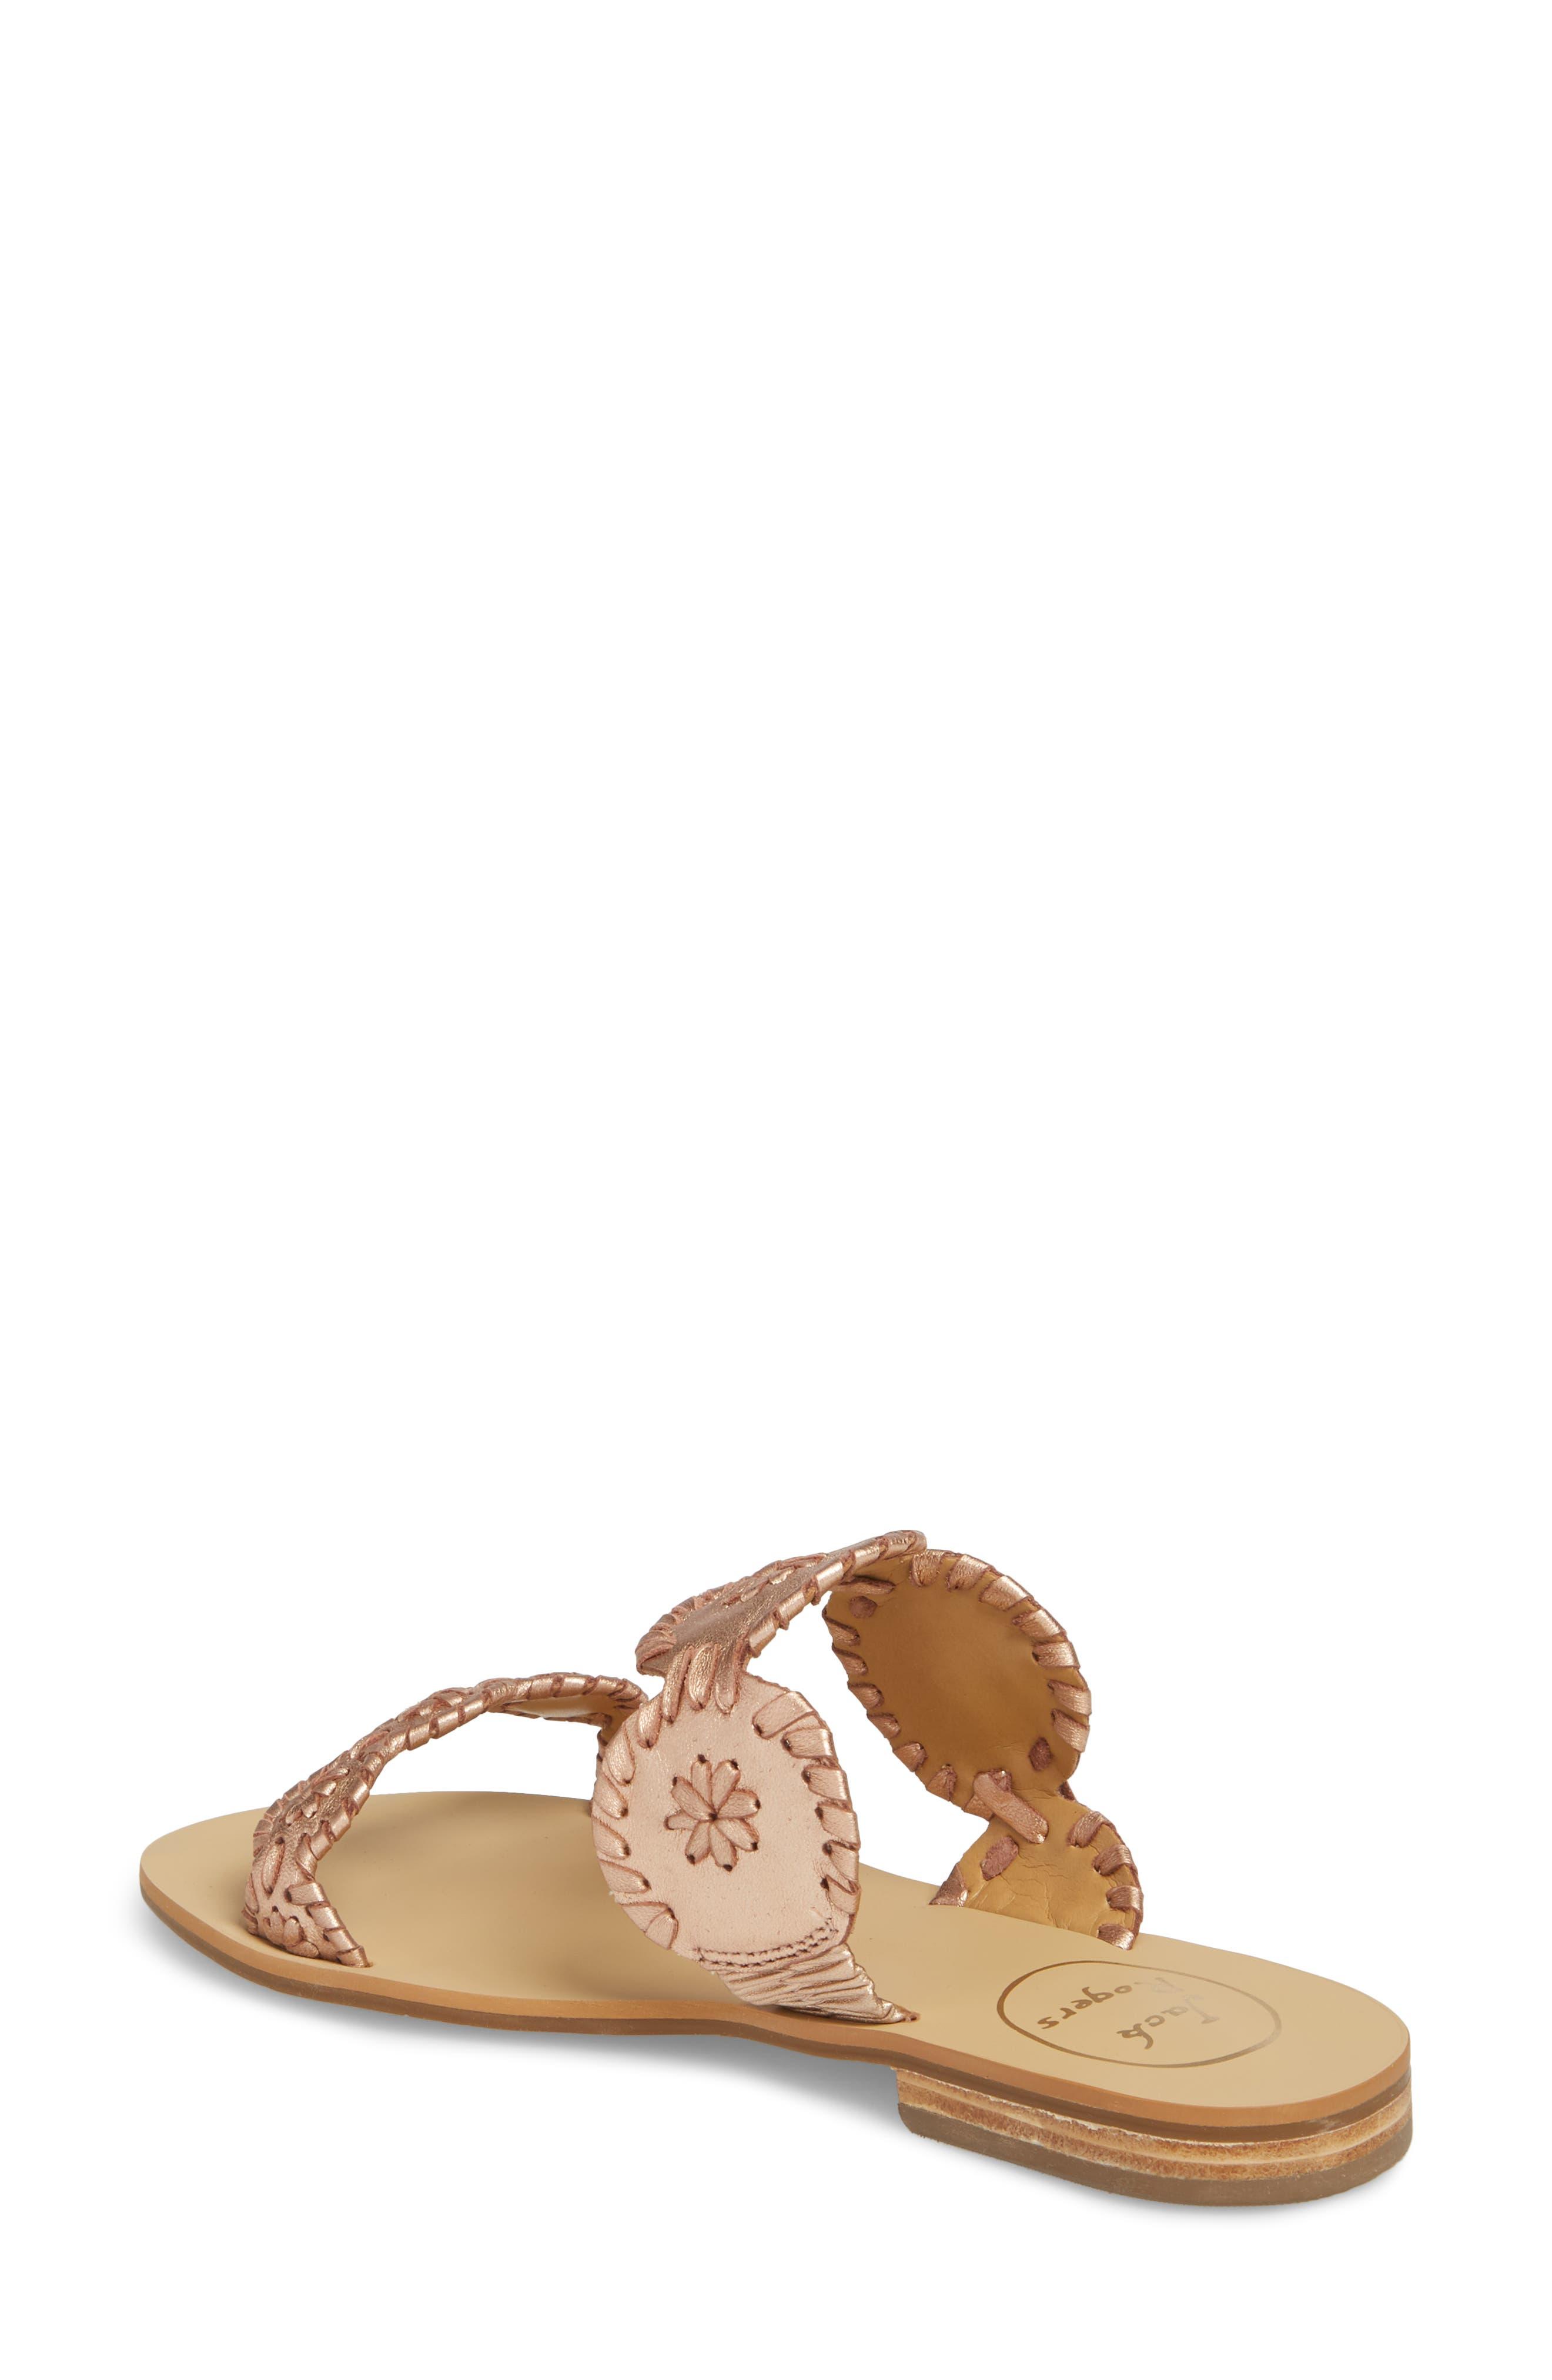 'Lauren' Sandal,                             Alternate thumbnail 2, color,                             Rose Gold Leather